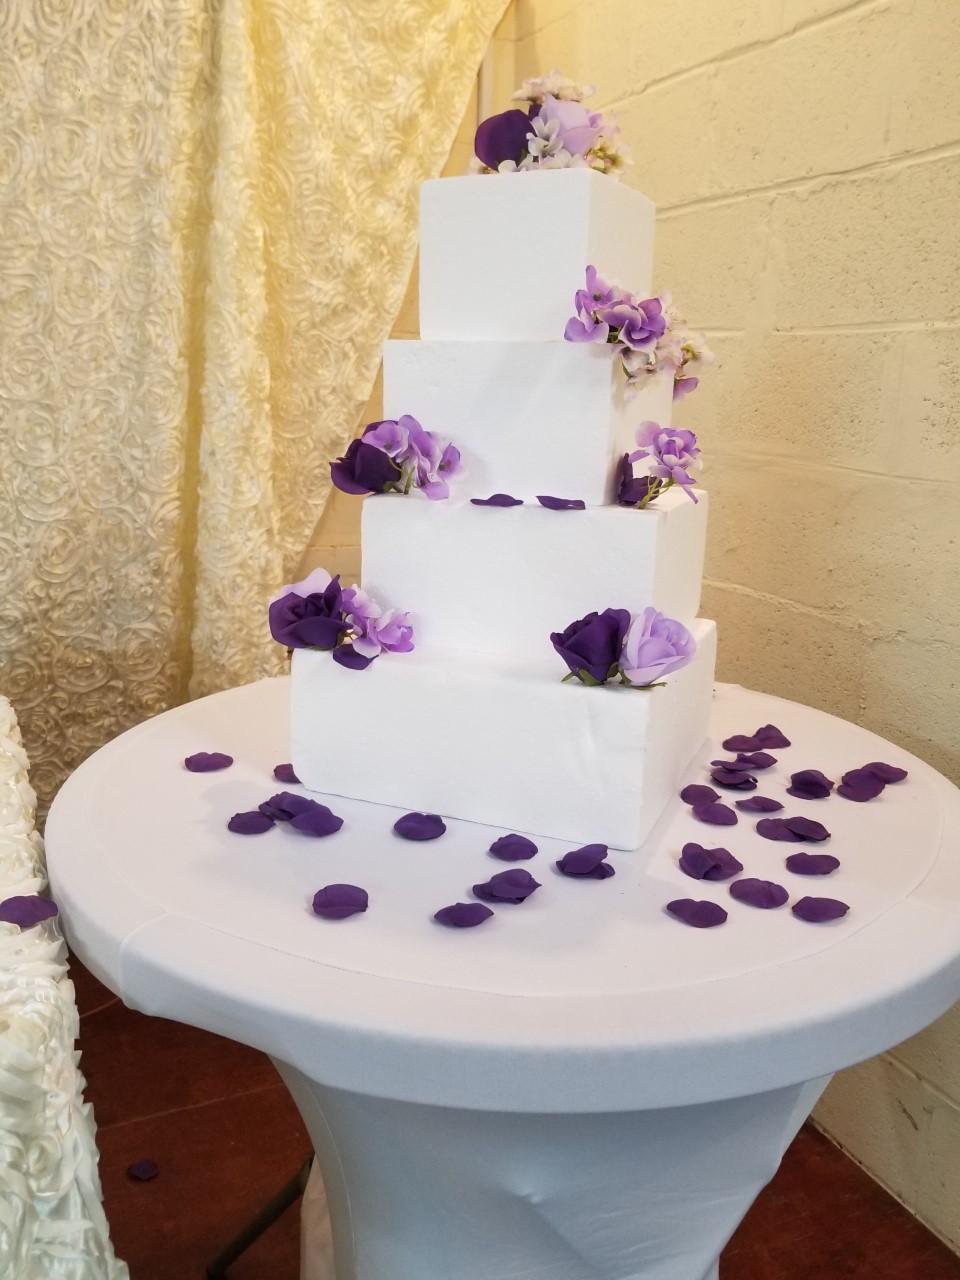 _20200104_184006- cake